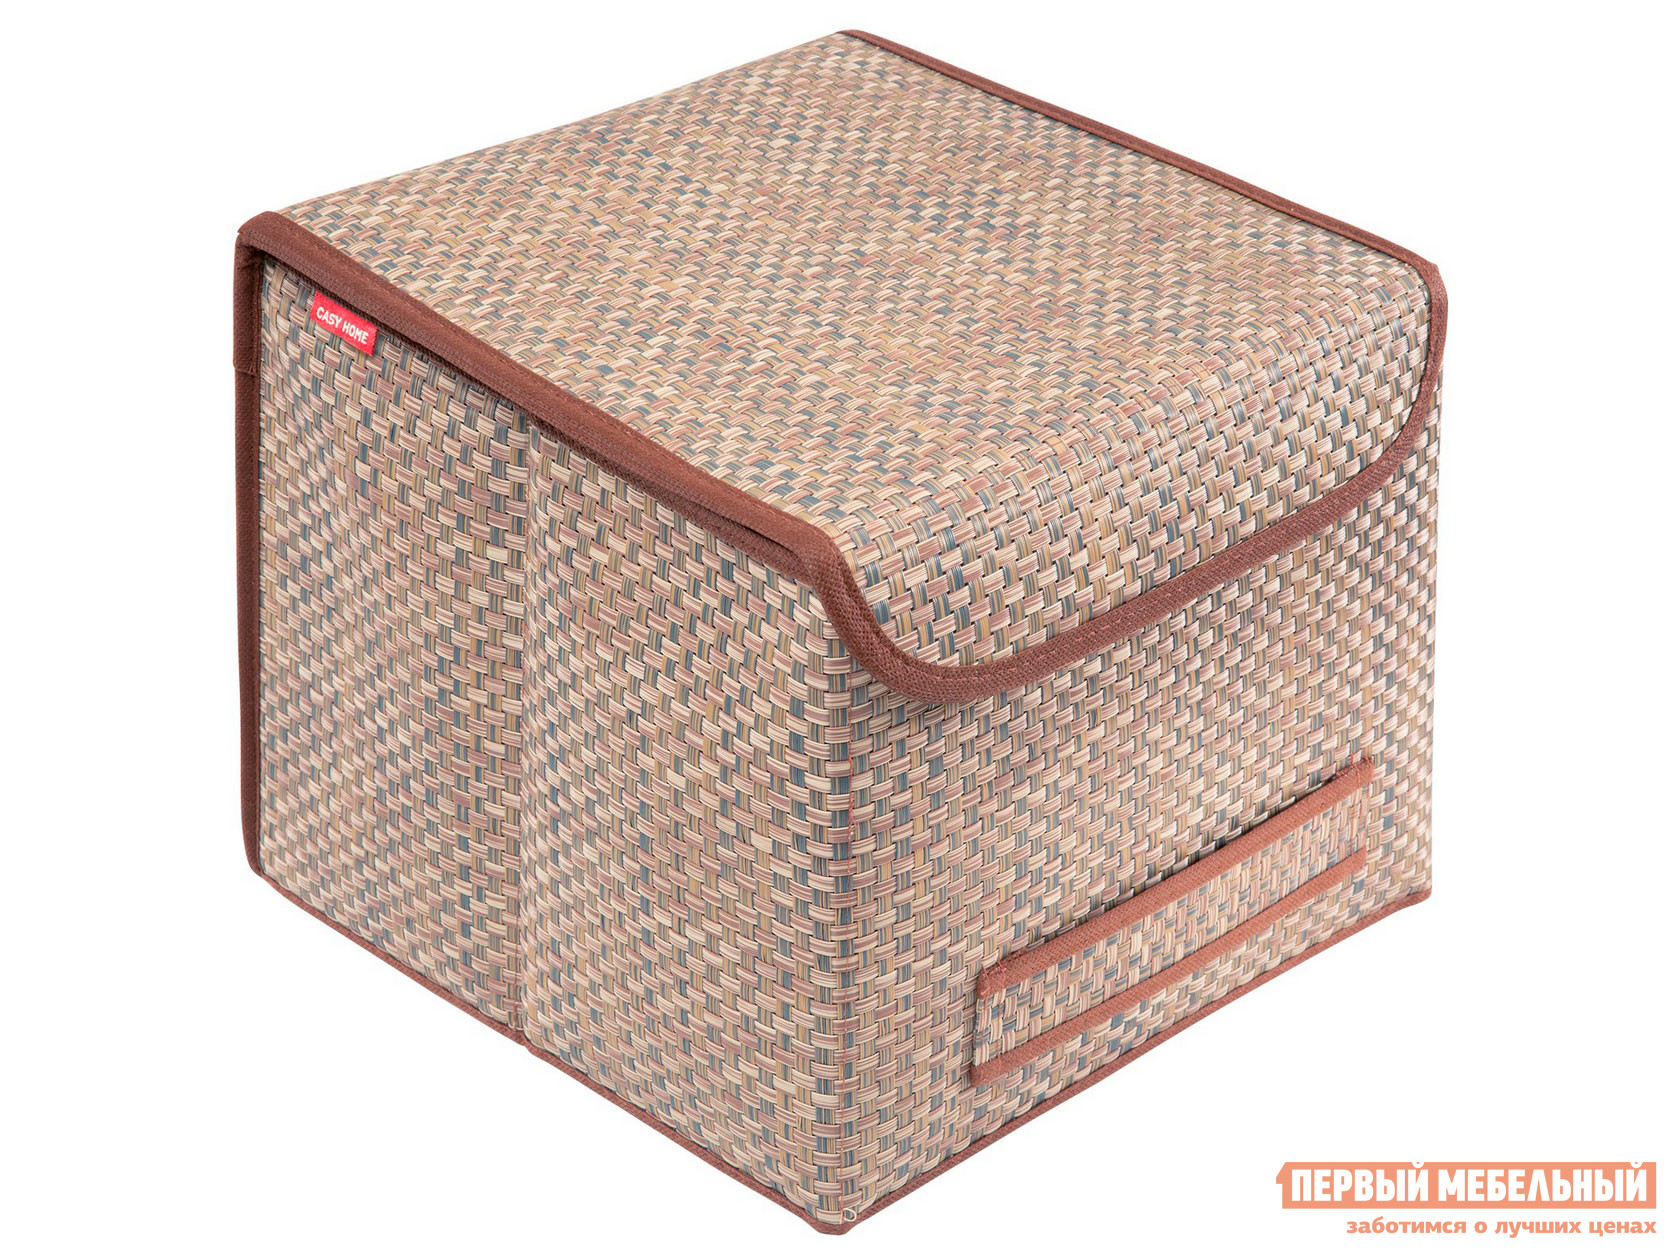 Кофр  Коробка для хранения с крышкой 30х30х24см Бежевый